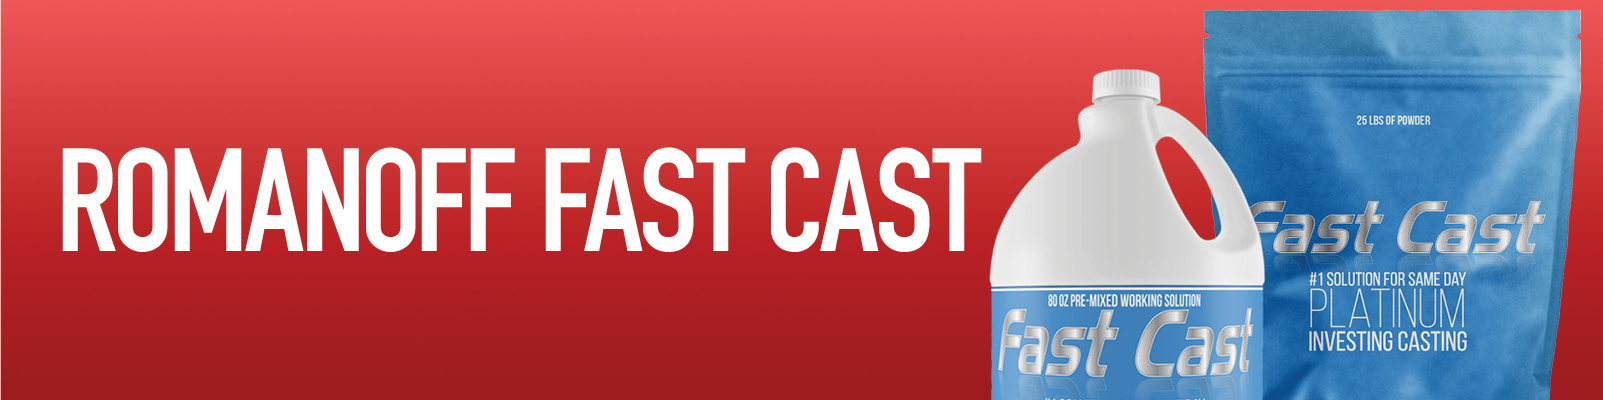 Romanoff Fast Cast